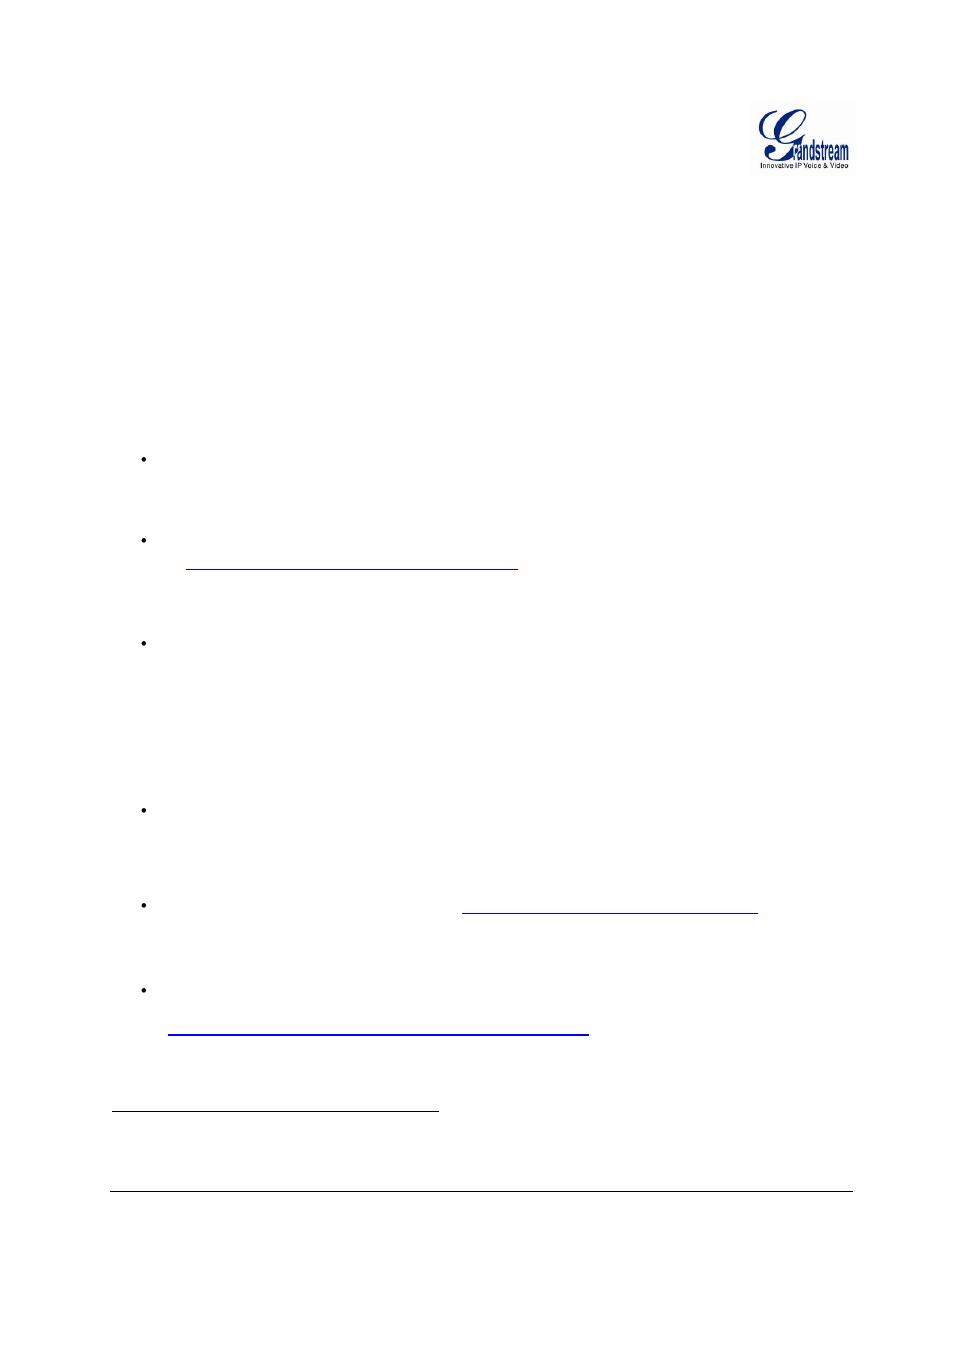 Oftware, Pgrade | Grandstream Networks HT502 User Manual